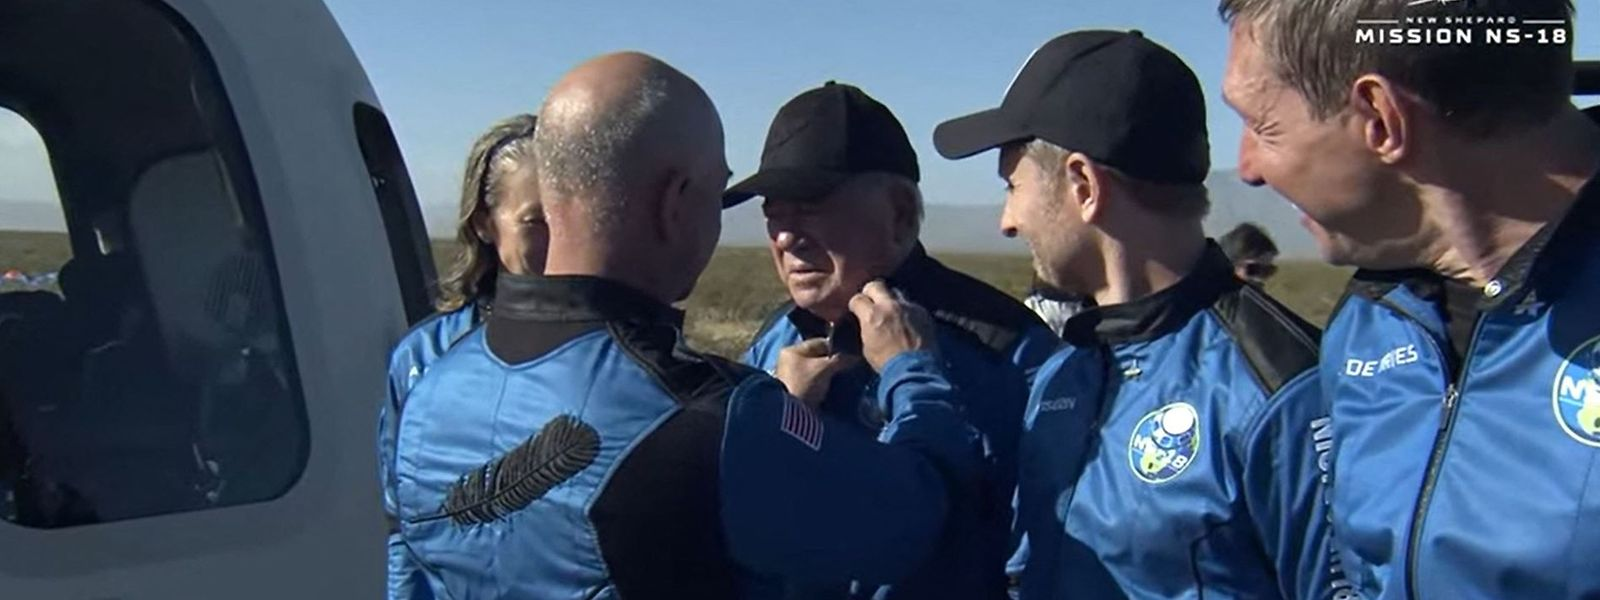 Jeff Bezos beglückwünschte Shatner persönlich nach dem Flug.